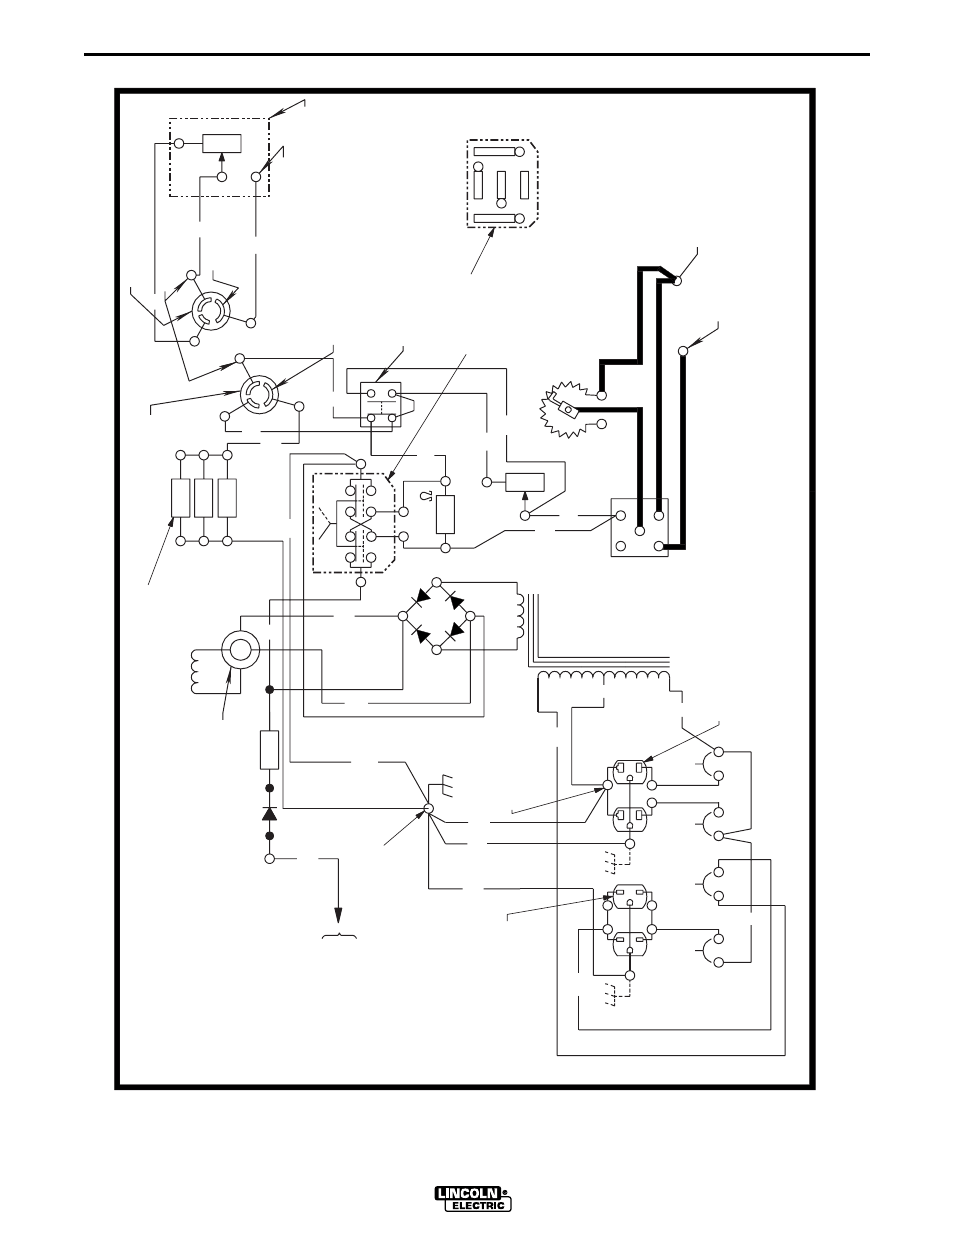 Lincoln Welder Wiring Schematic Mig Diagram Migmate Wire Feed Problem Outlet Diagramrhsvlcusdesign